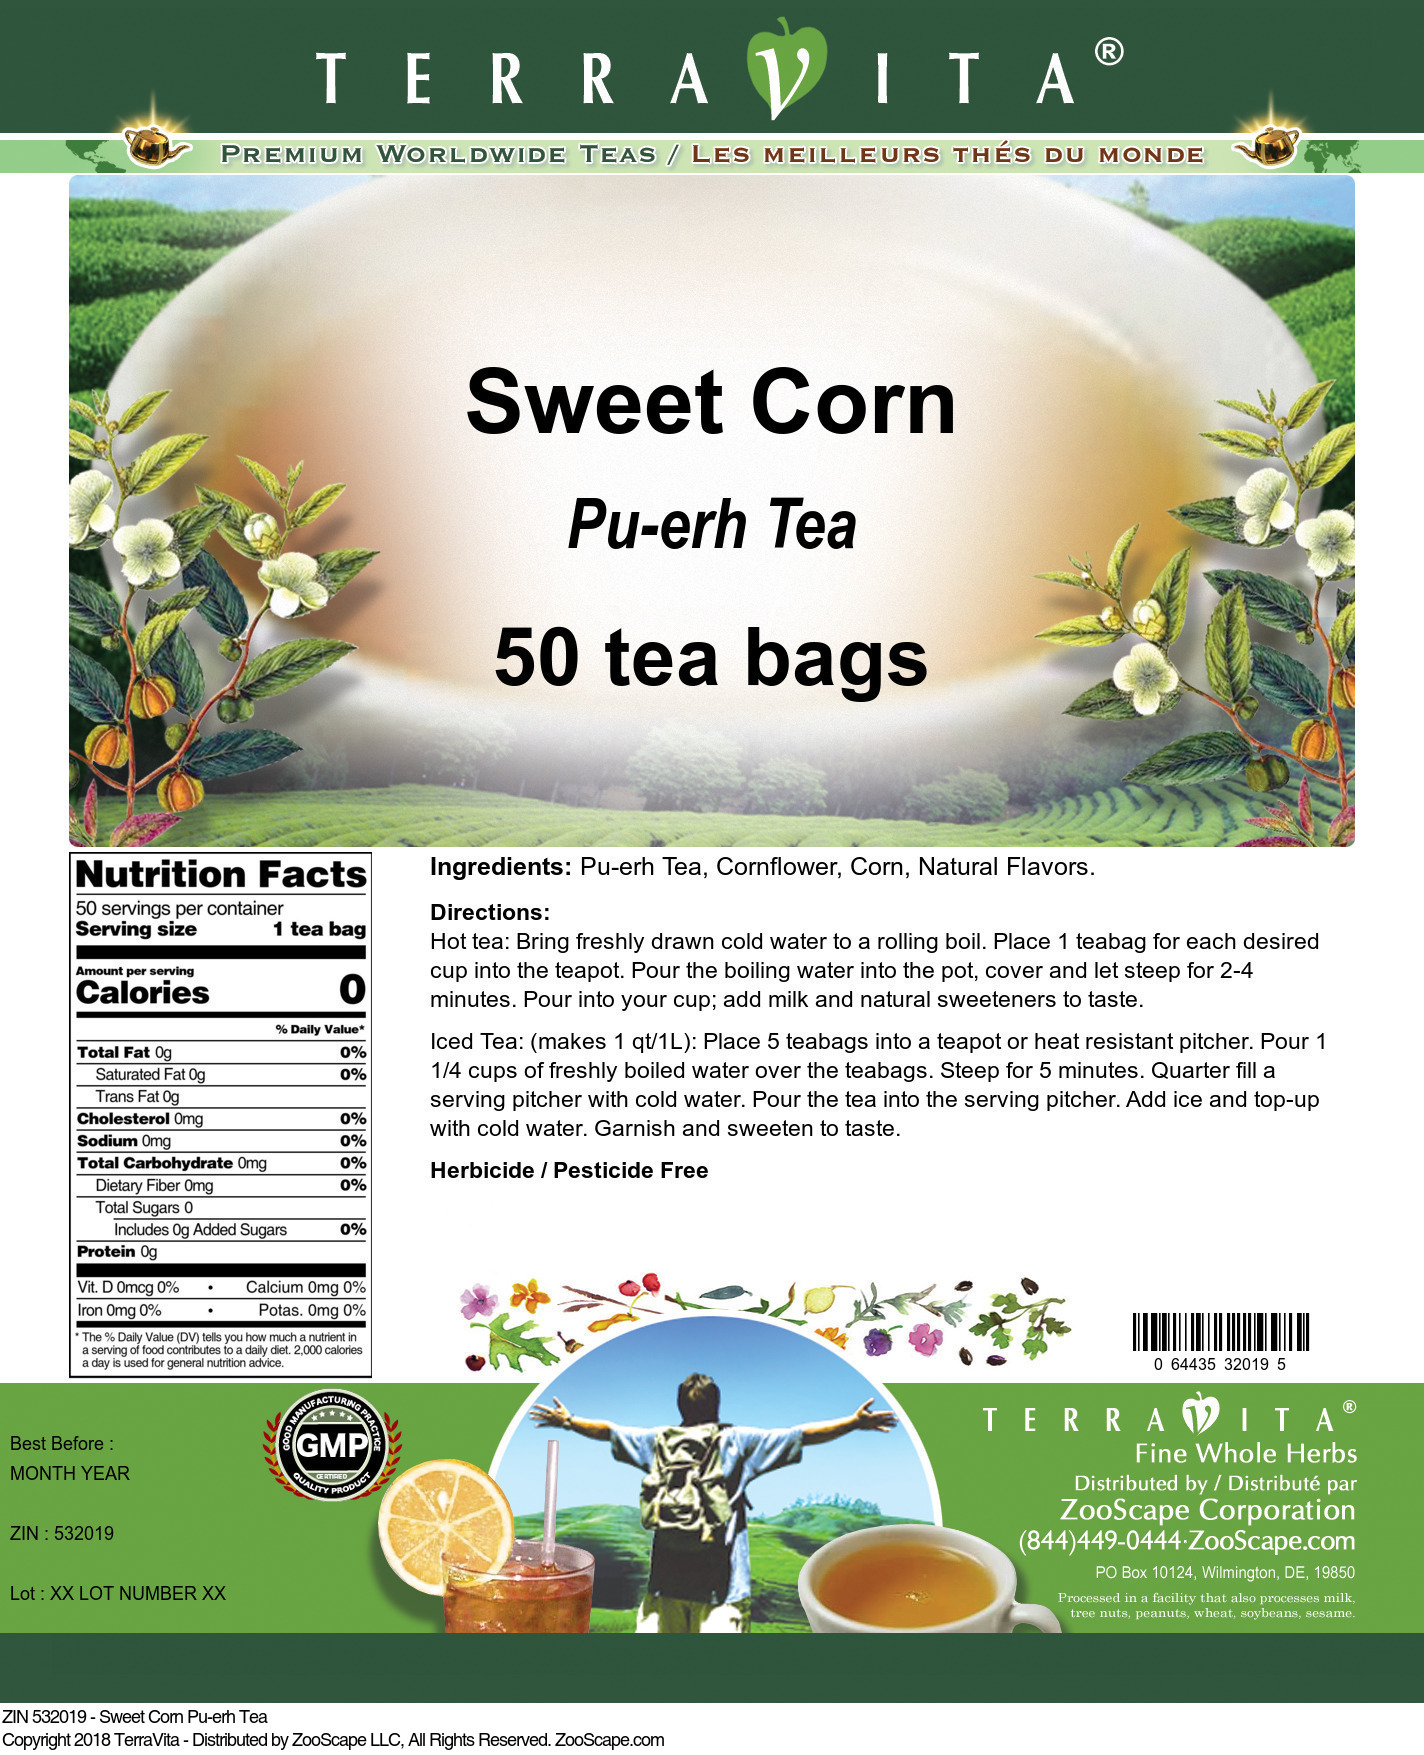 Sweet Corn Pu-erh Tea